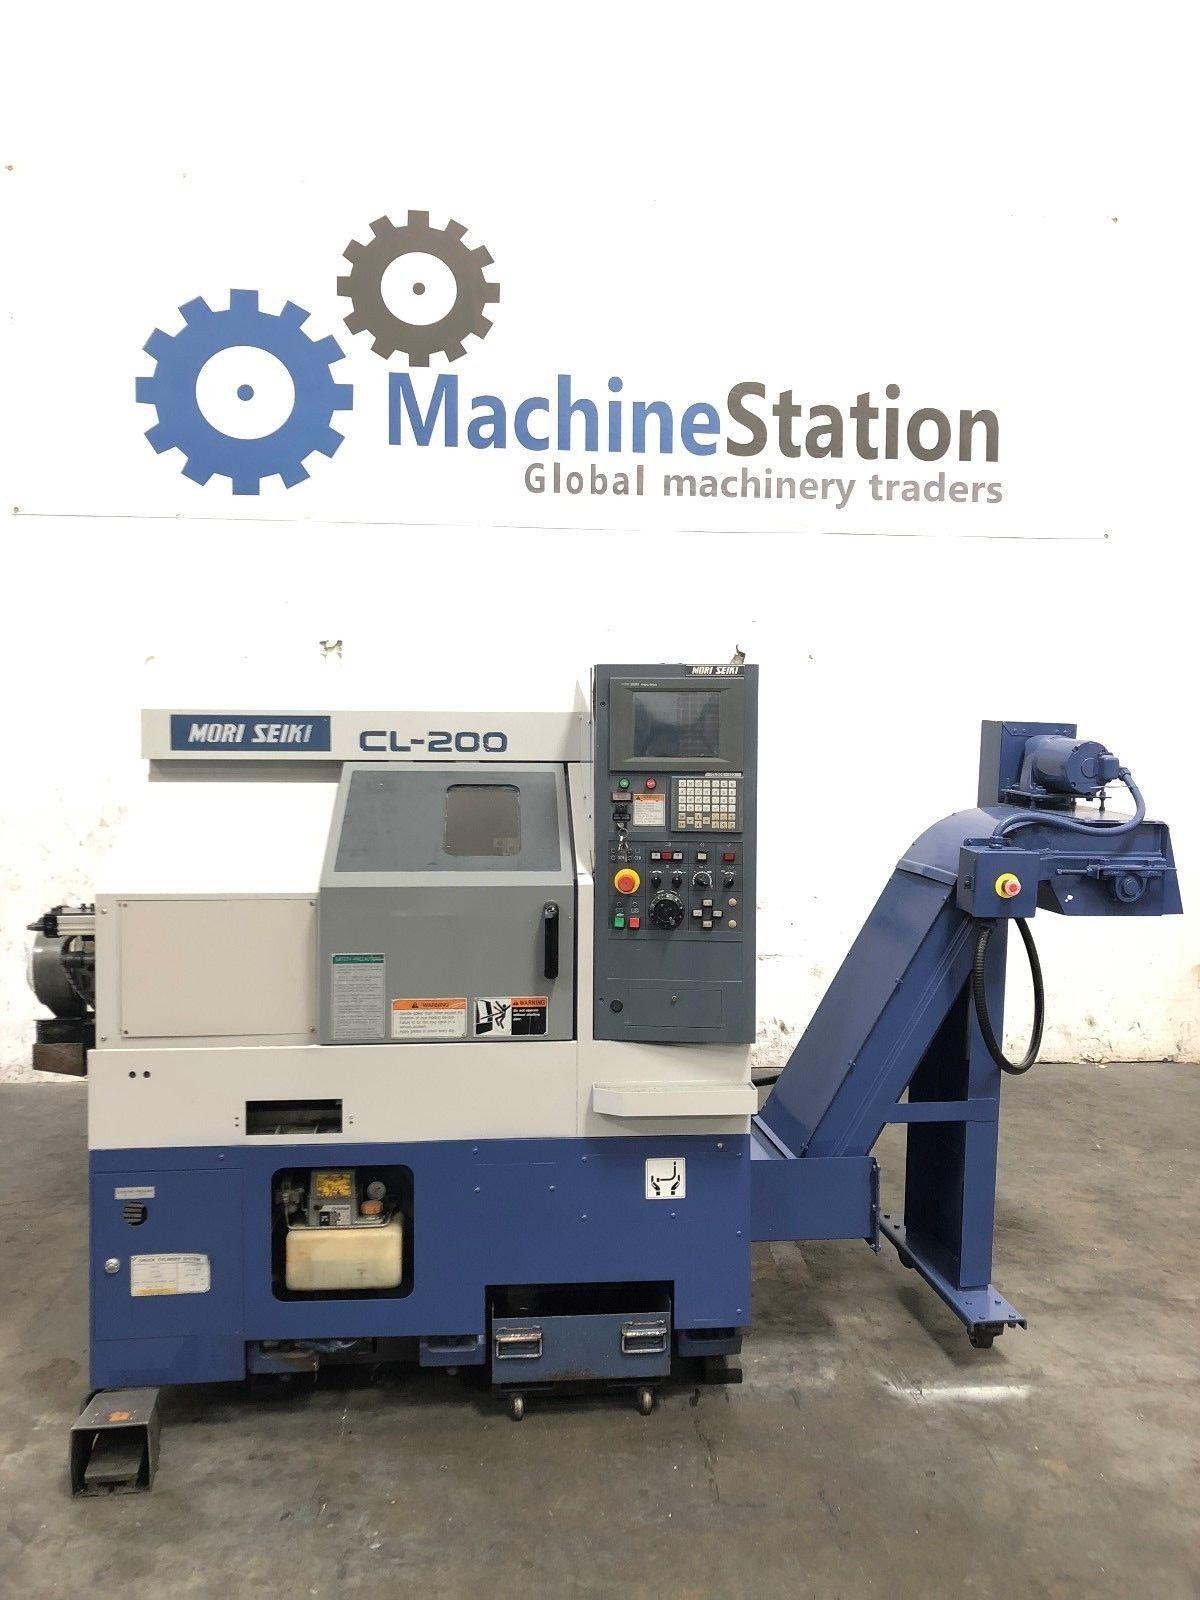 MORI SEIKI CL-200 CNC TURNING CENTER | CNC Lathes for Sale